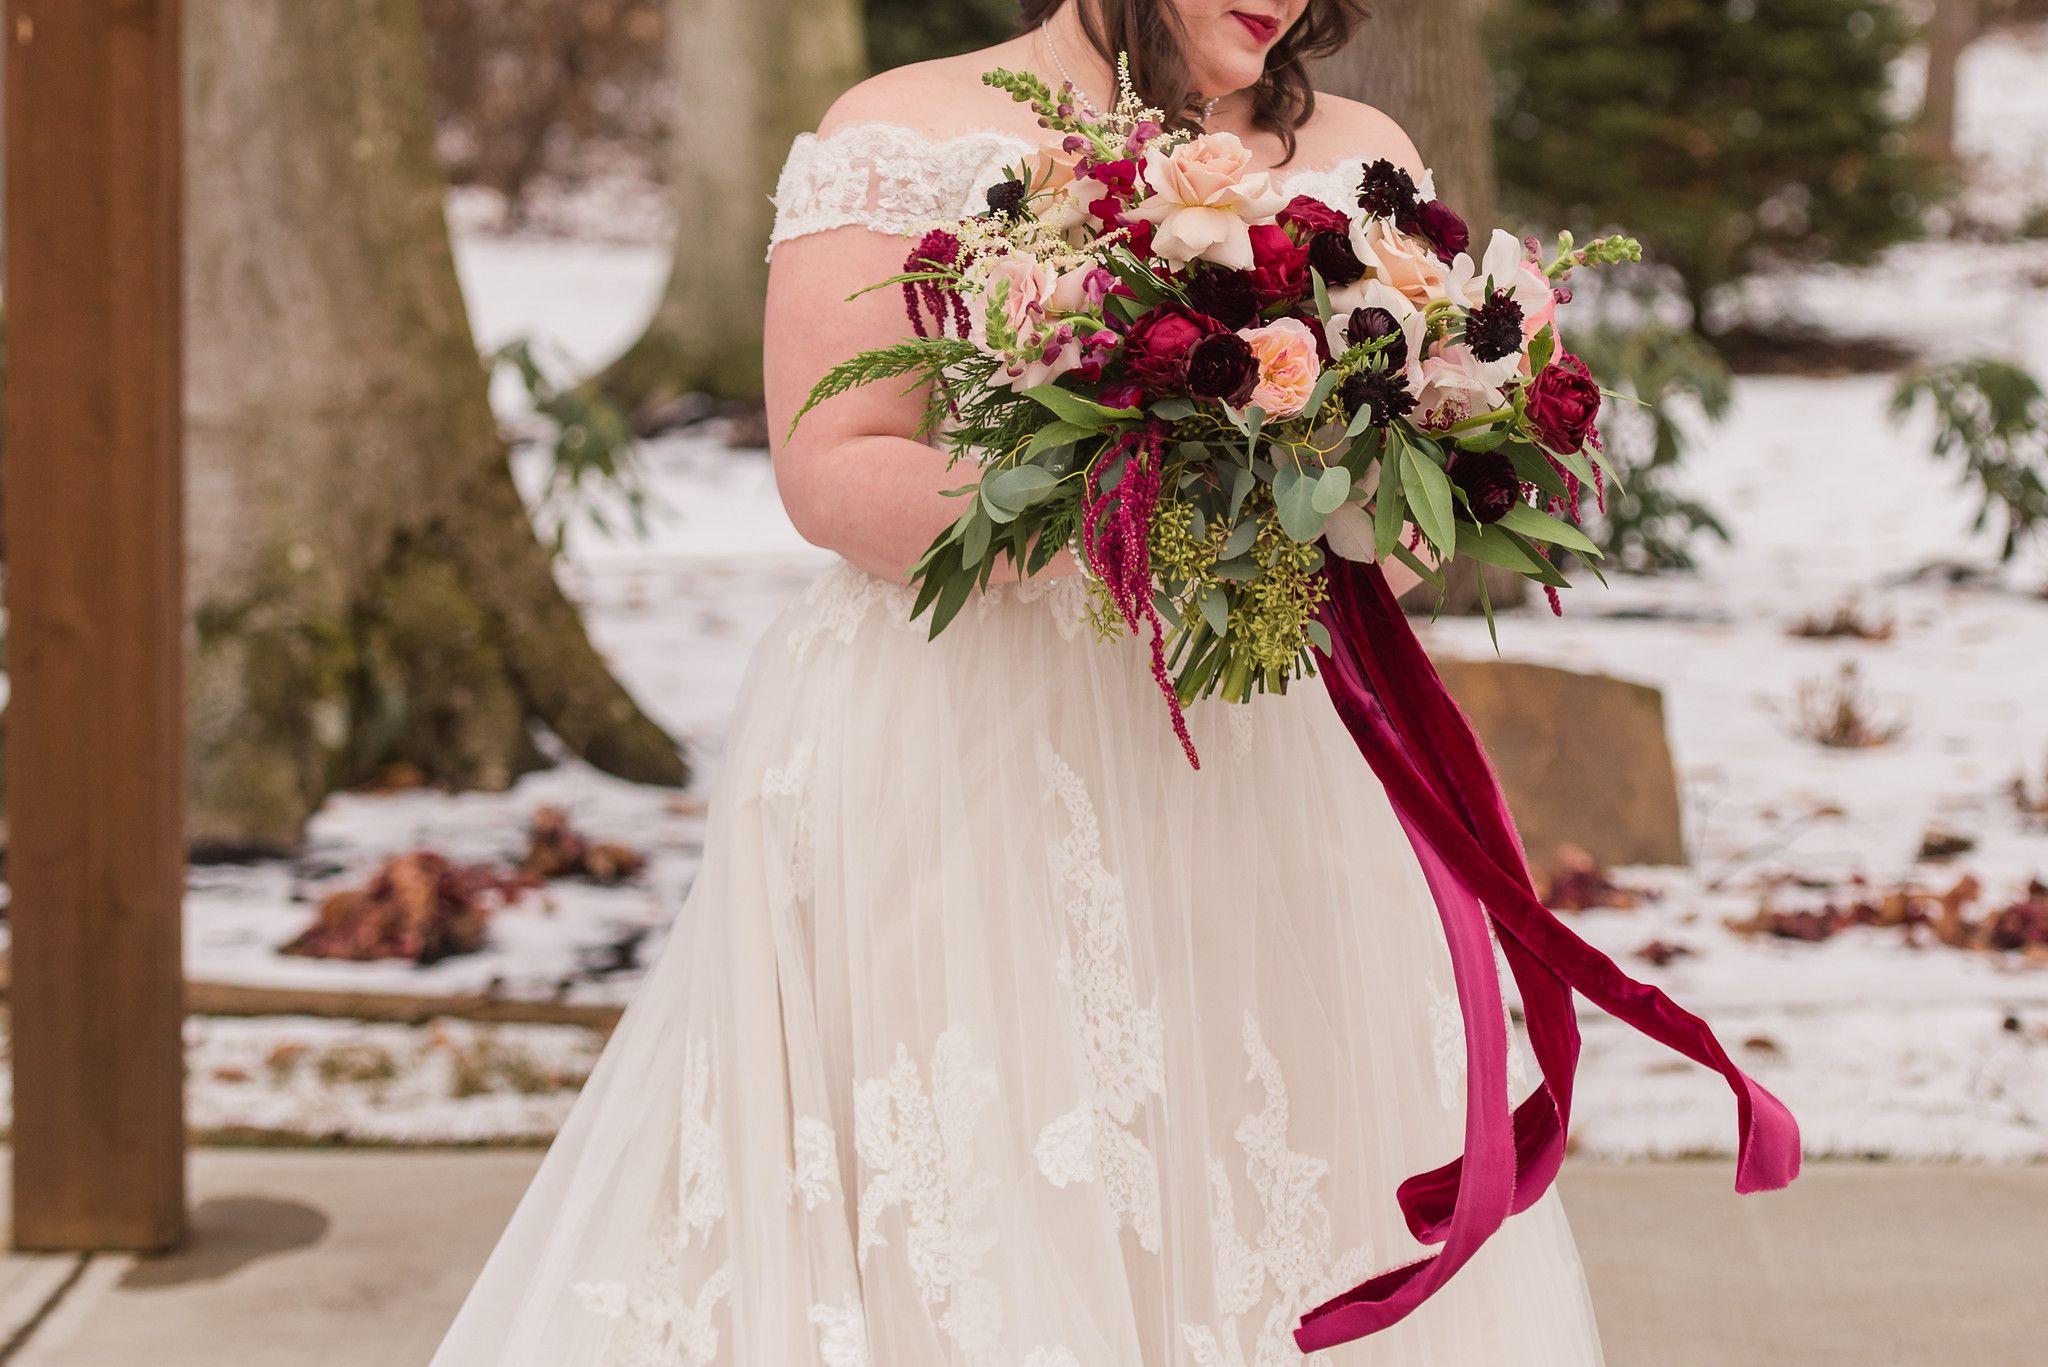 Southern Indiana Winter Wedding Burgundy And Blush Winter Bridal